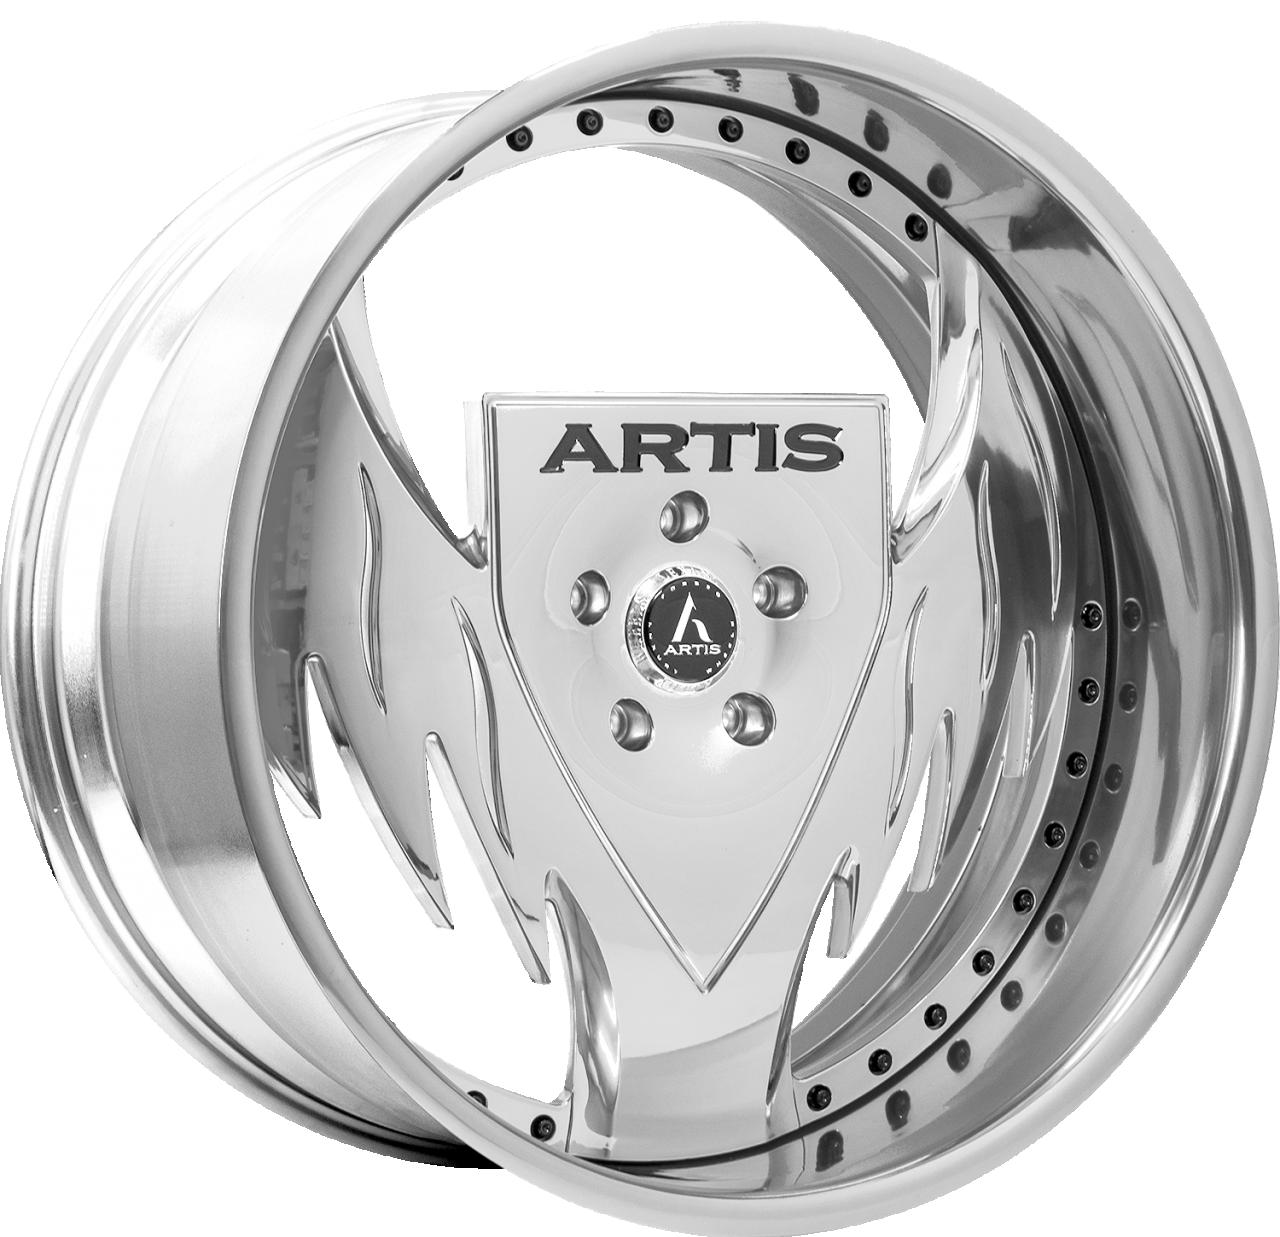 Artis Forged Batman wheel with Chrome finish